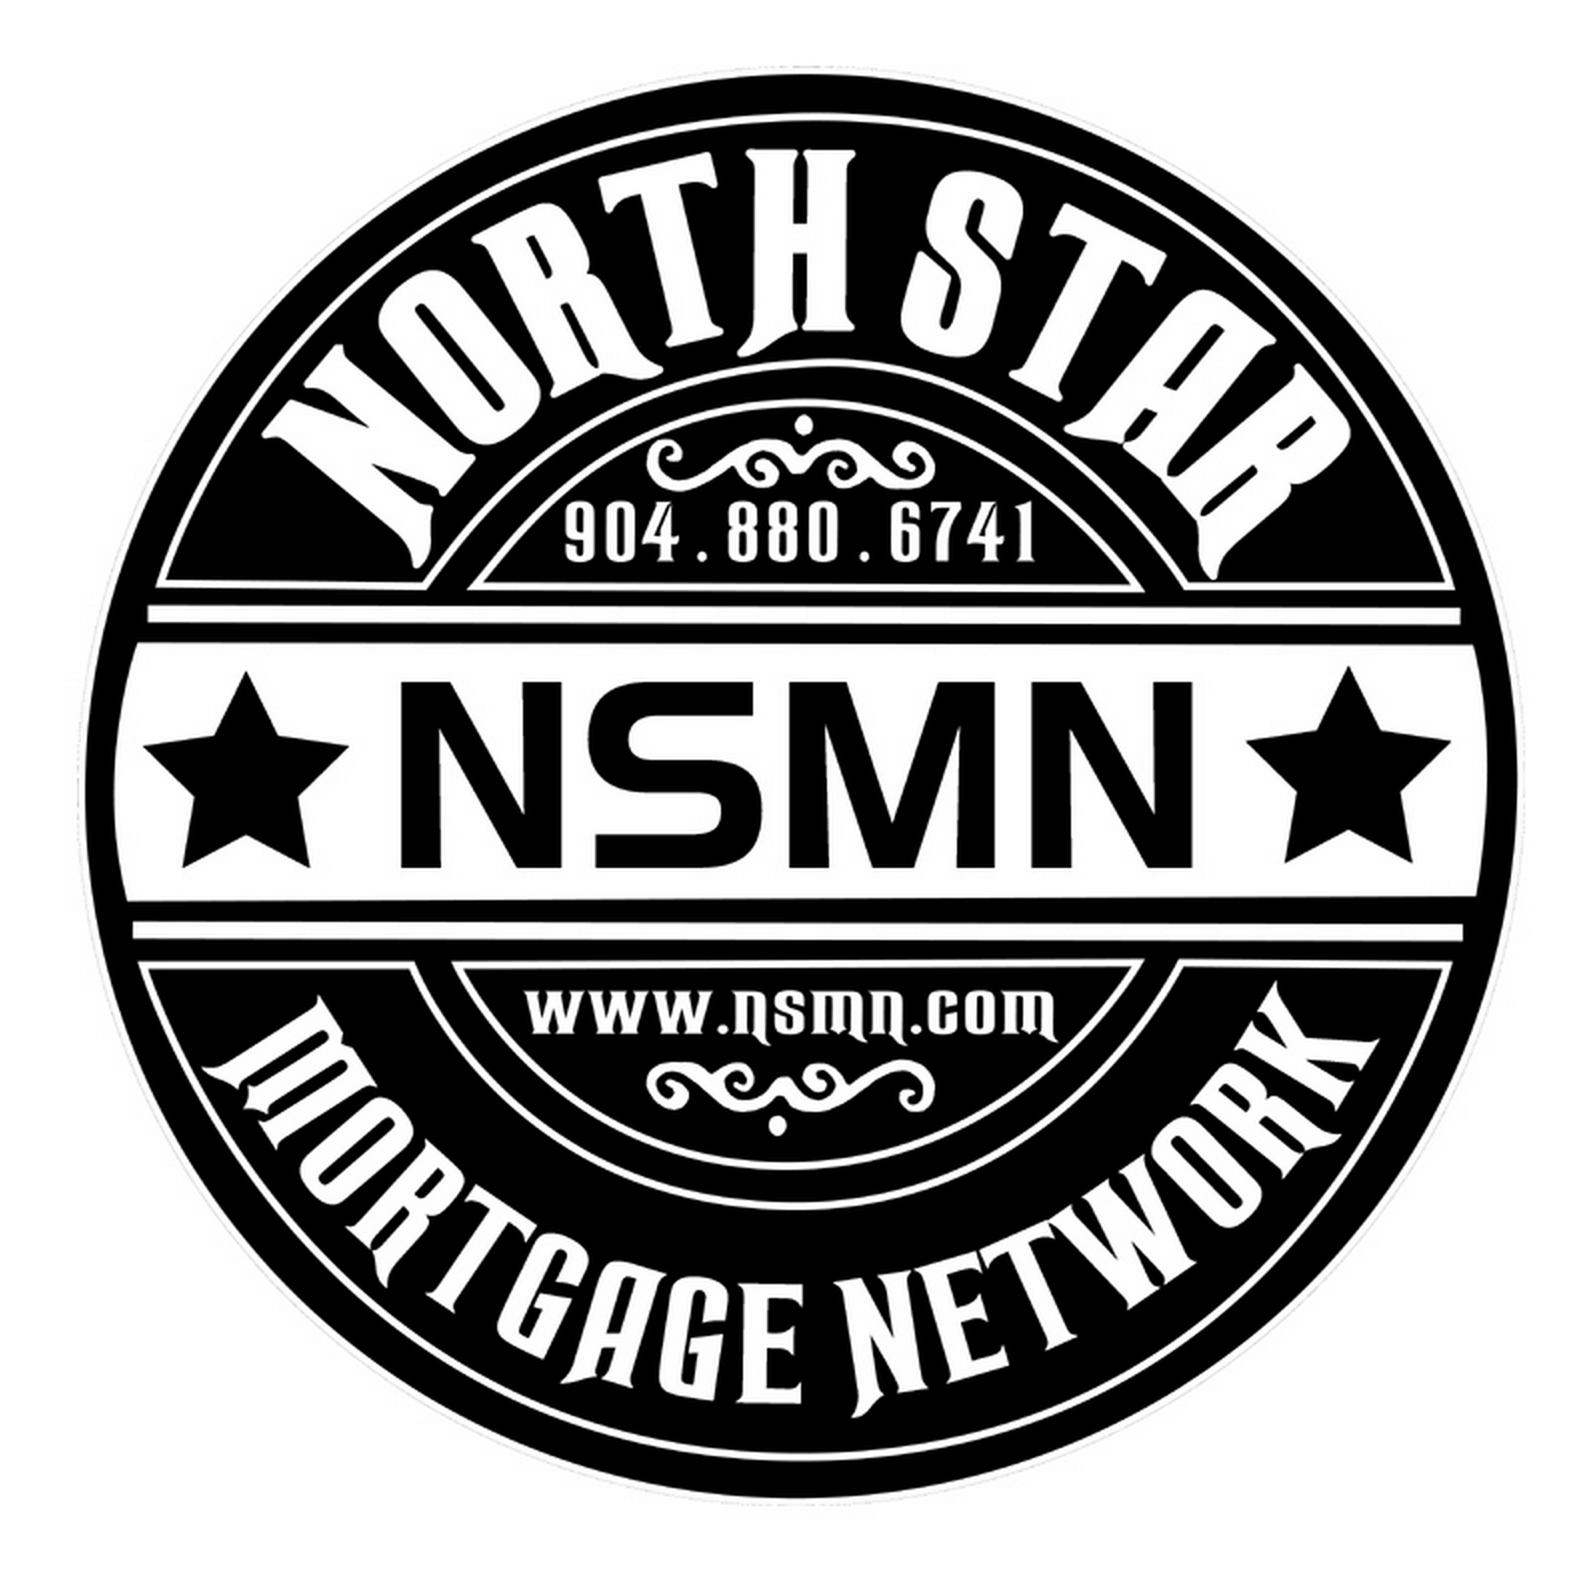 North Star Mortgage Network Inc.